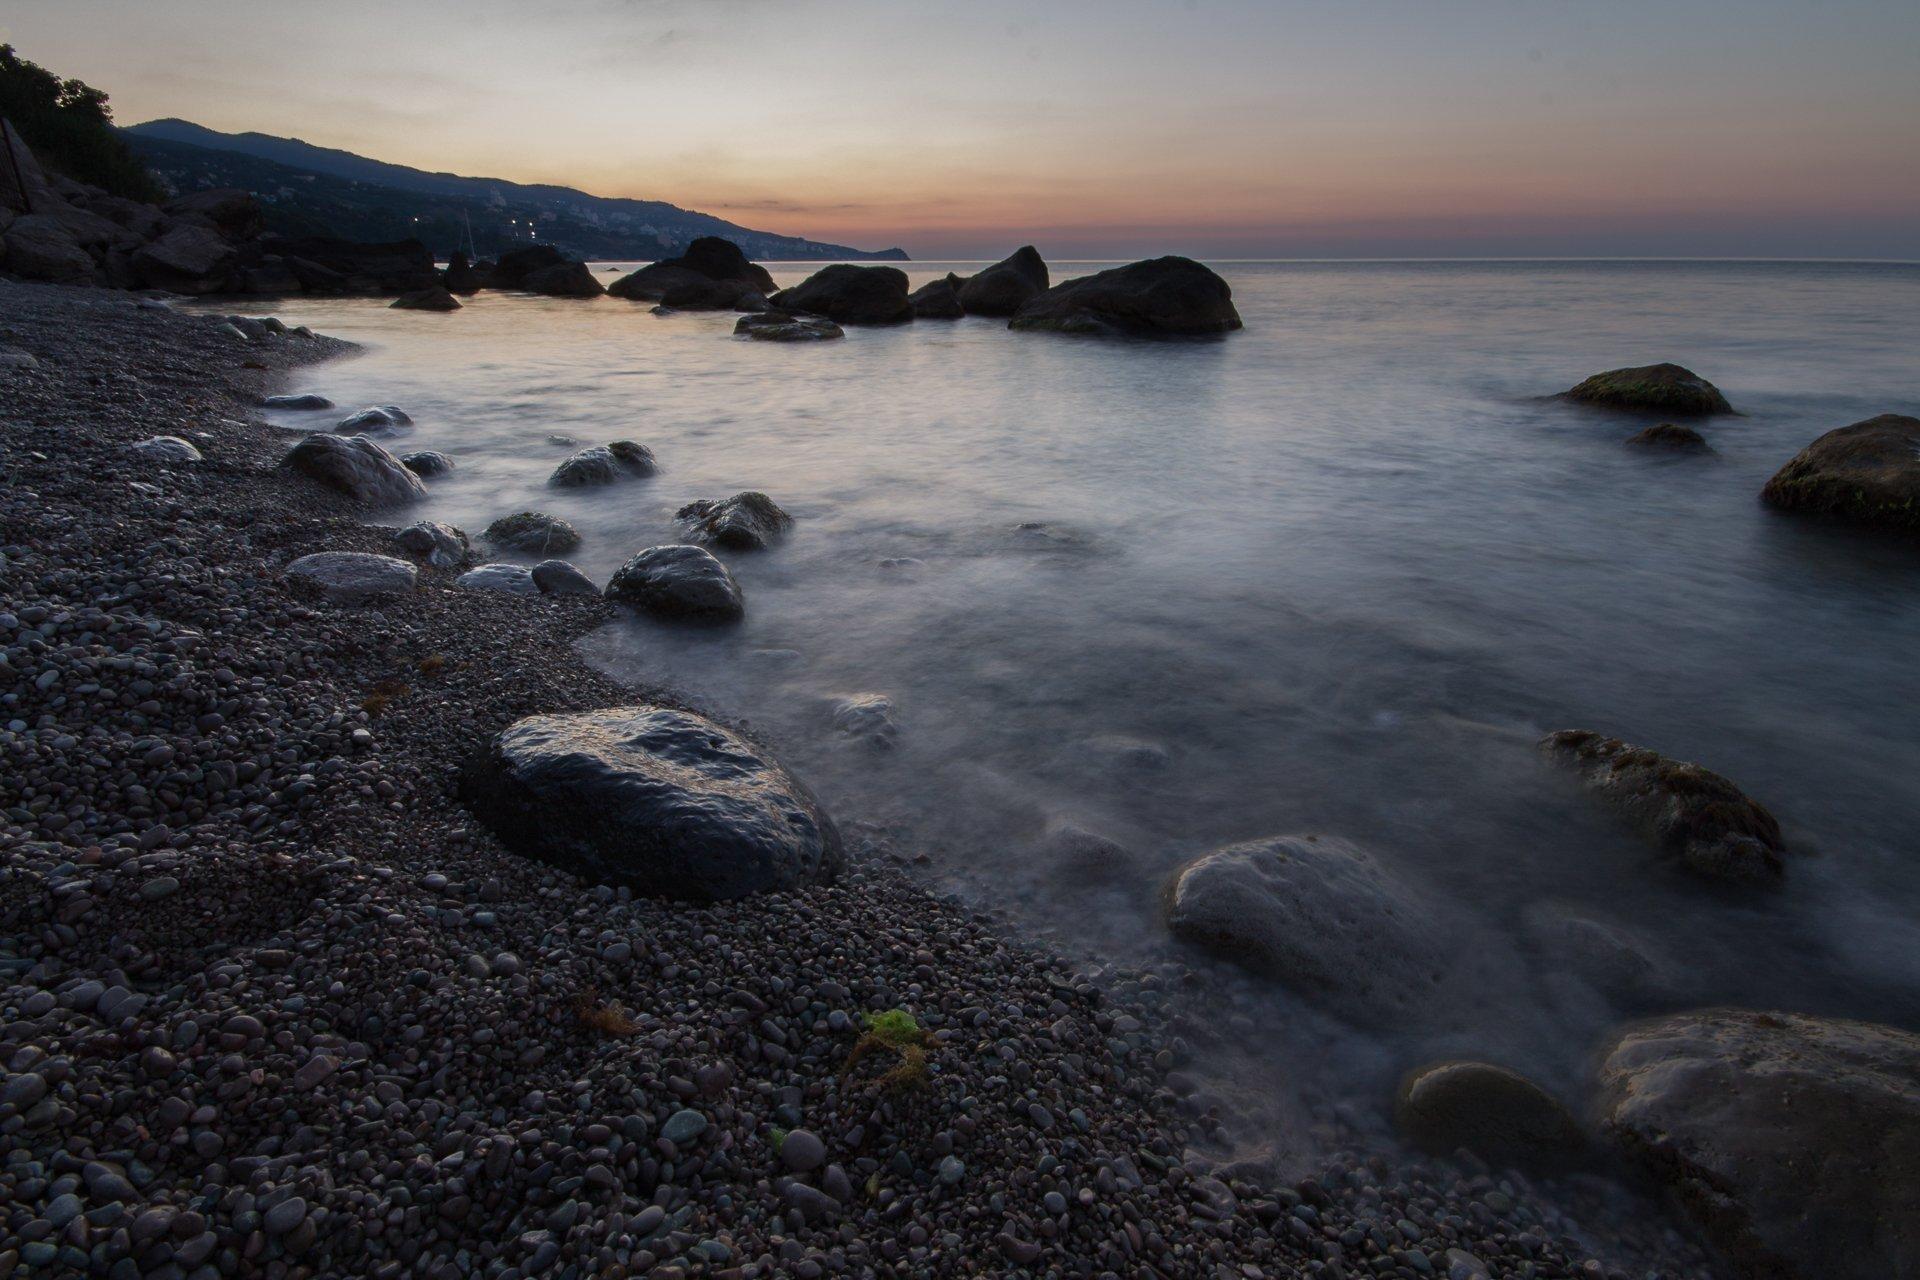 алексей платонов ,море, алупка, рассвет,камни, Платонов Алексей